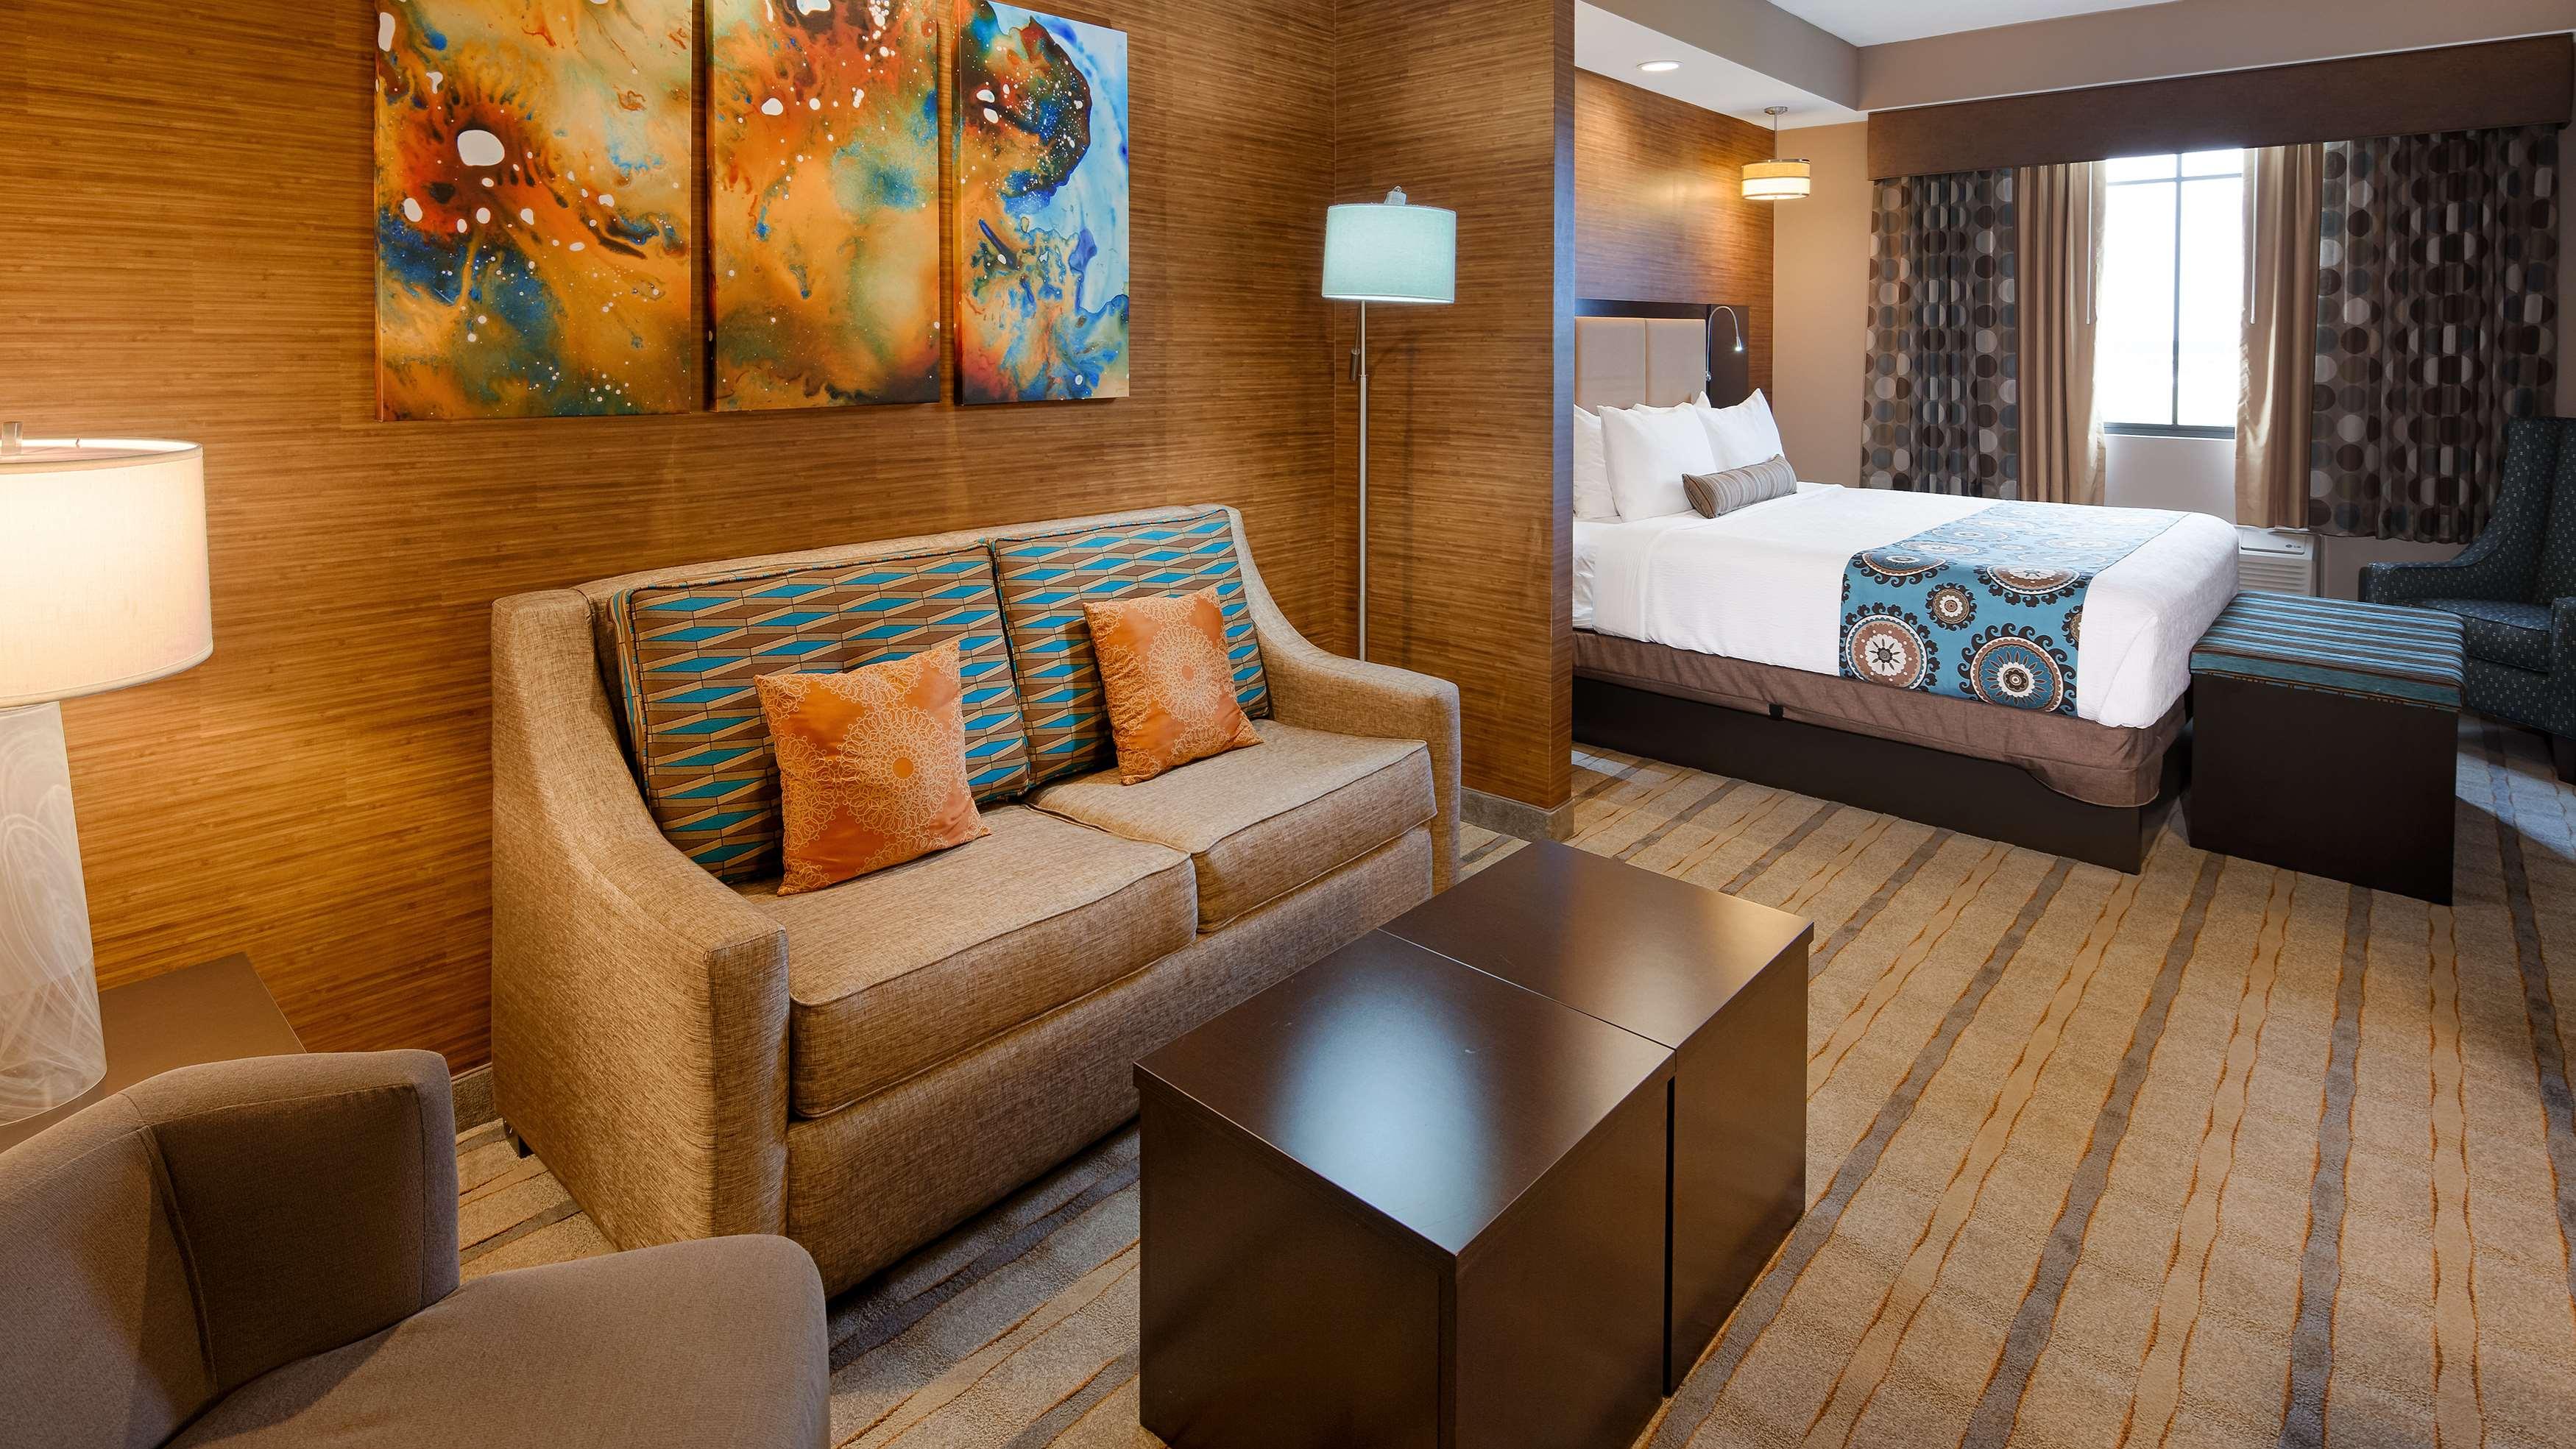 Best Western Plus Kendall Airport Hotel & Suites image 23